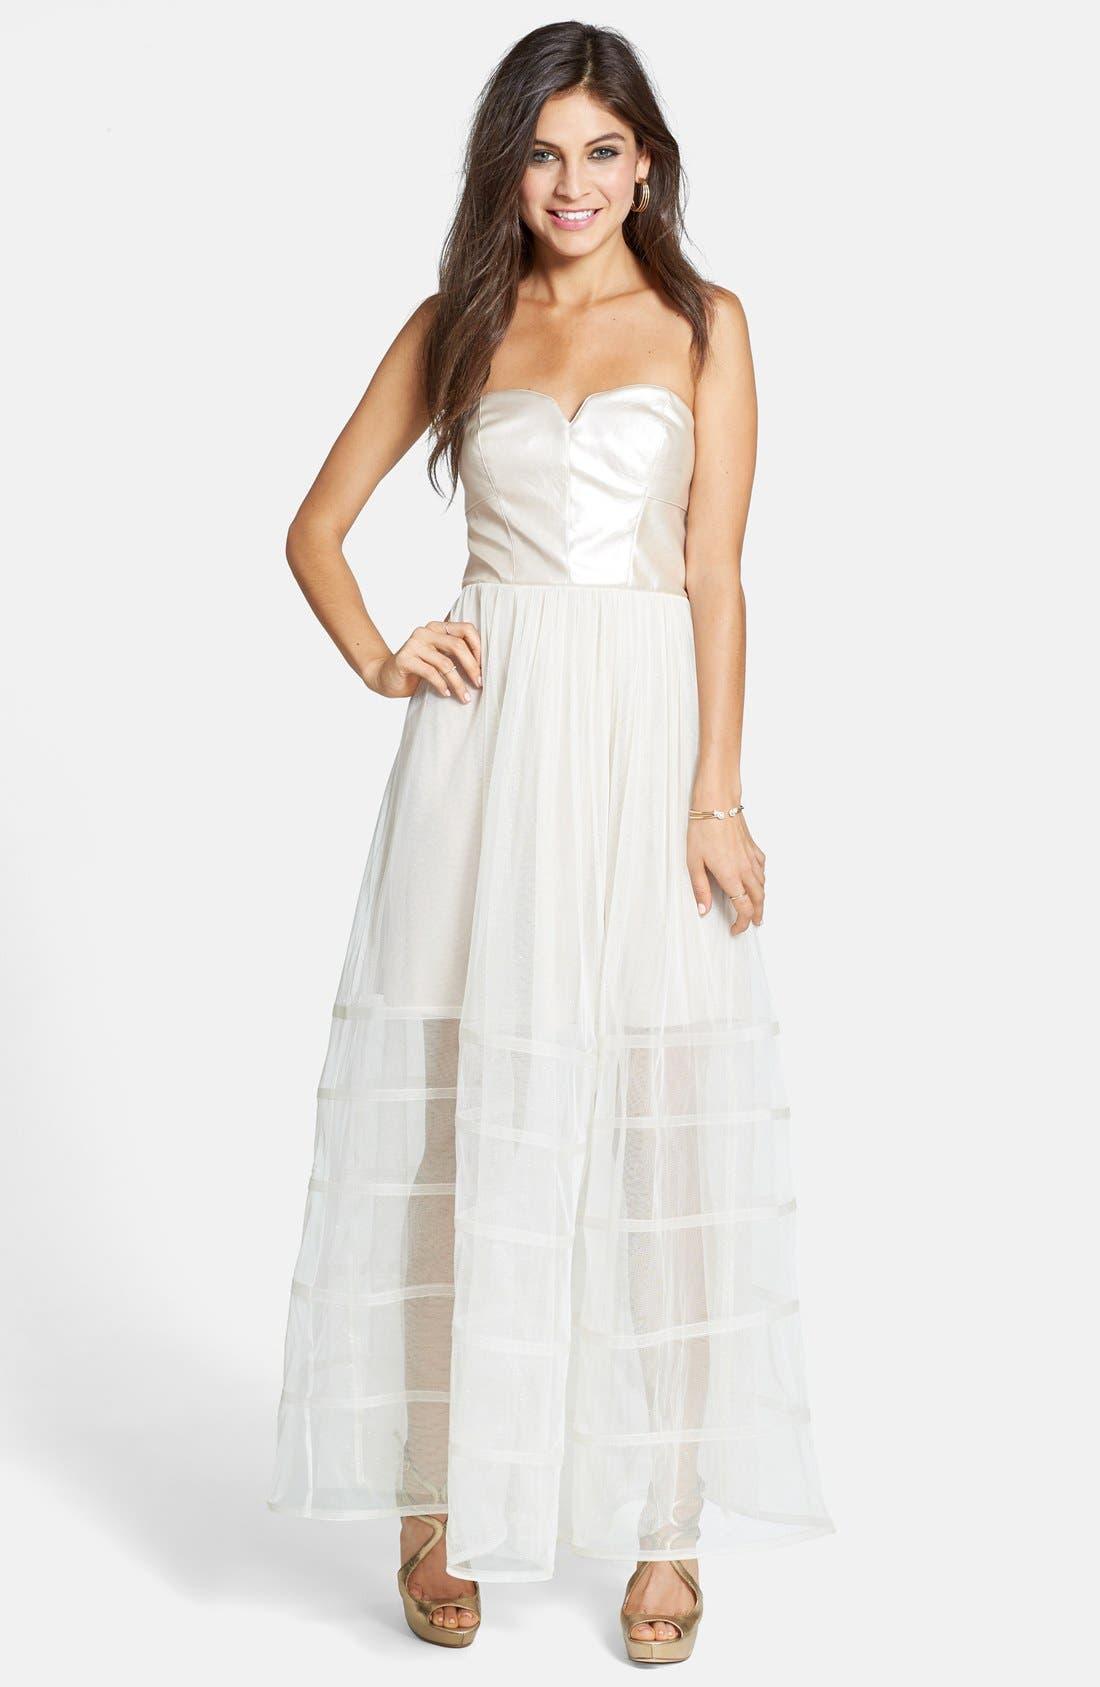 Alternate Image 1 Selected - Betsey Johnson Dot Print Lace Fit & Flare Dress